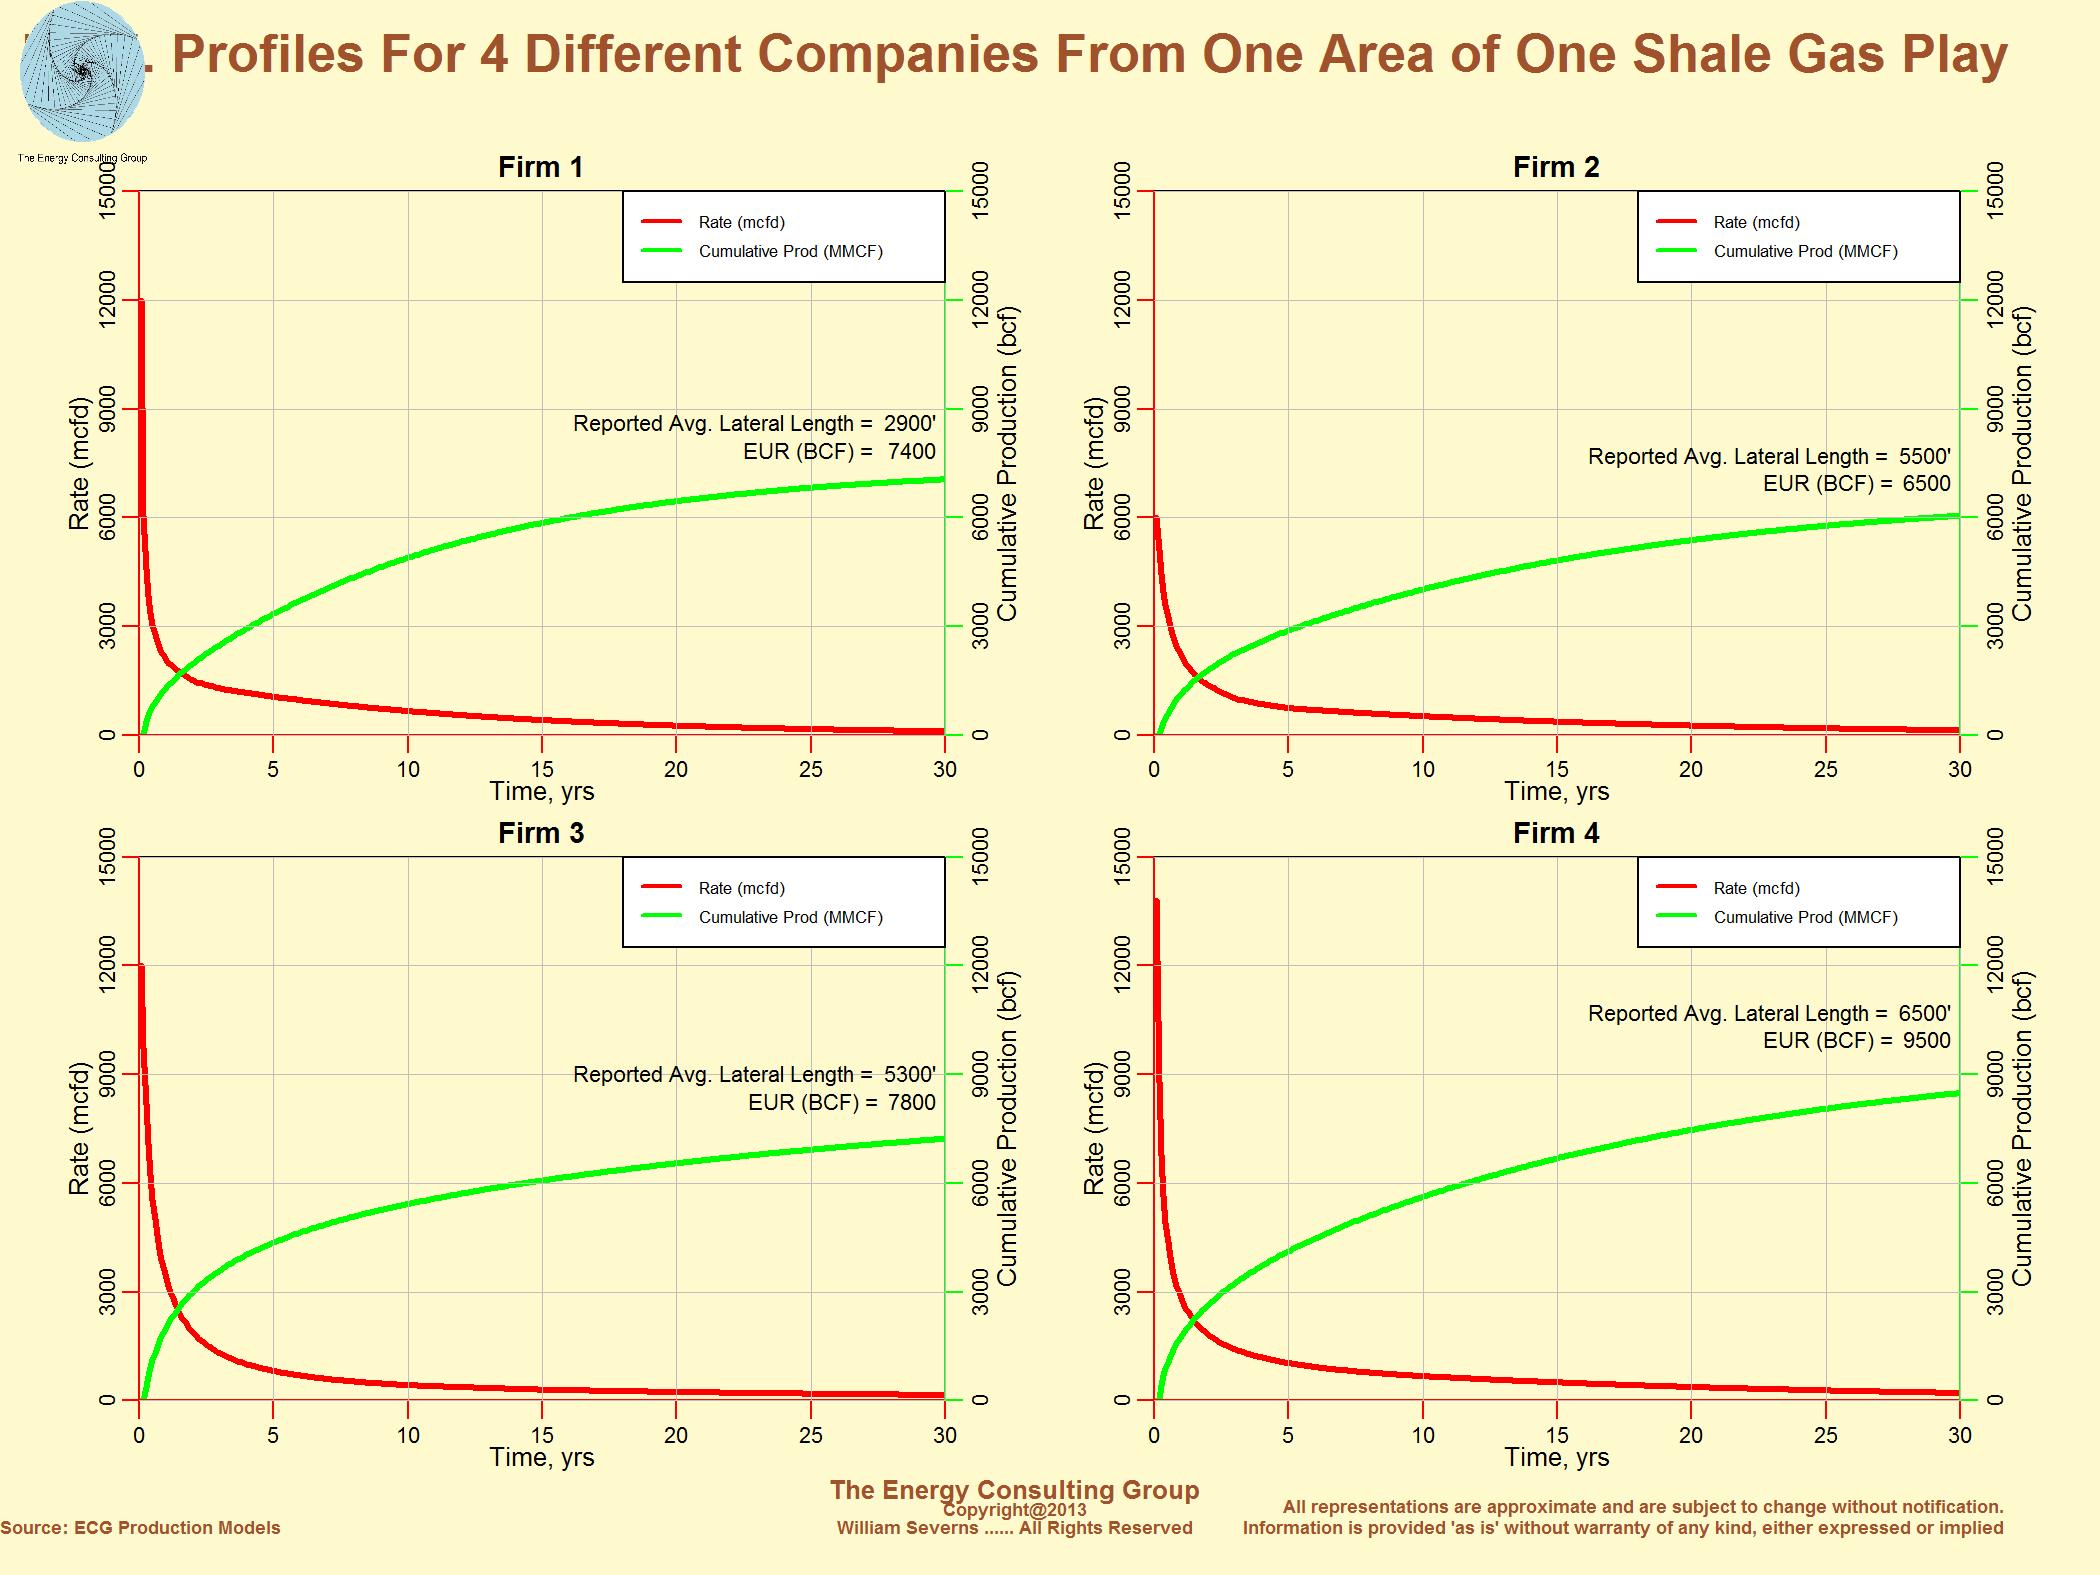 Economics of Shale Plays